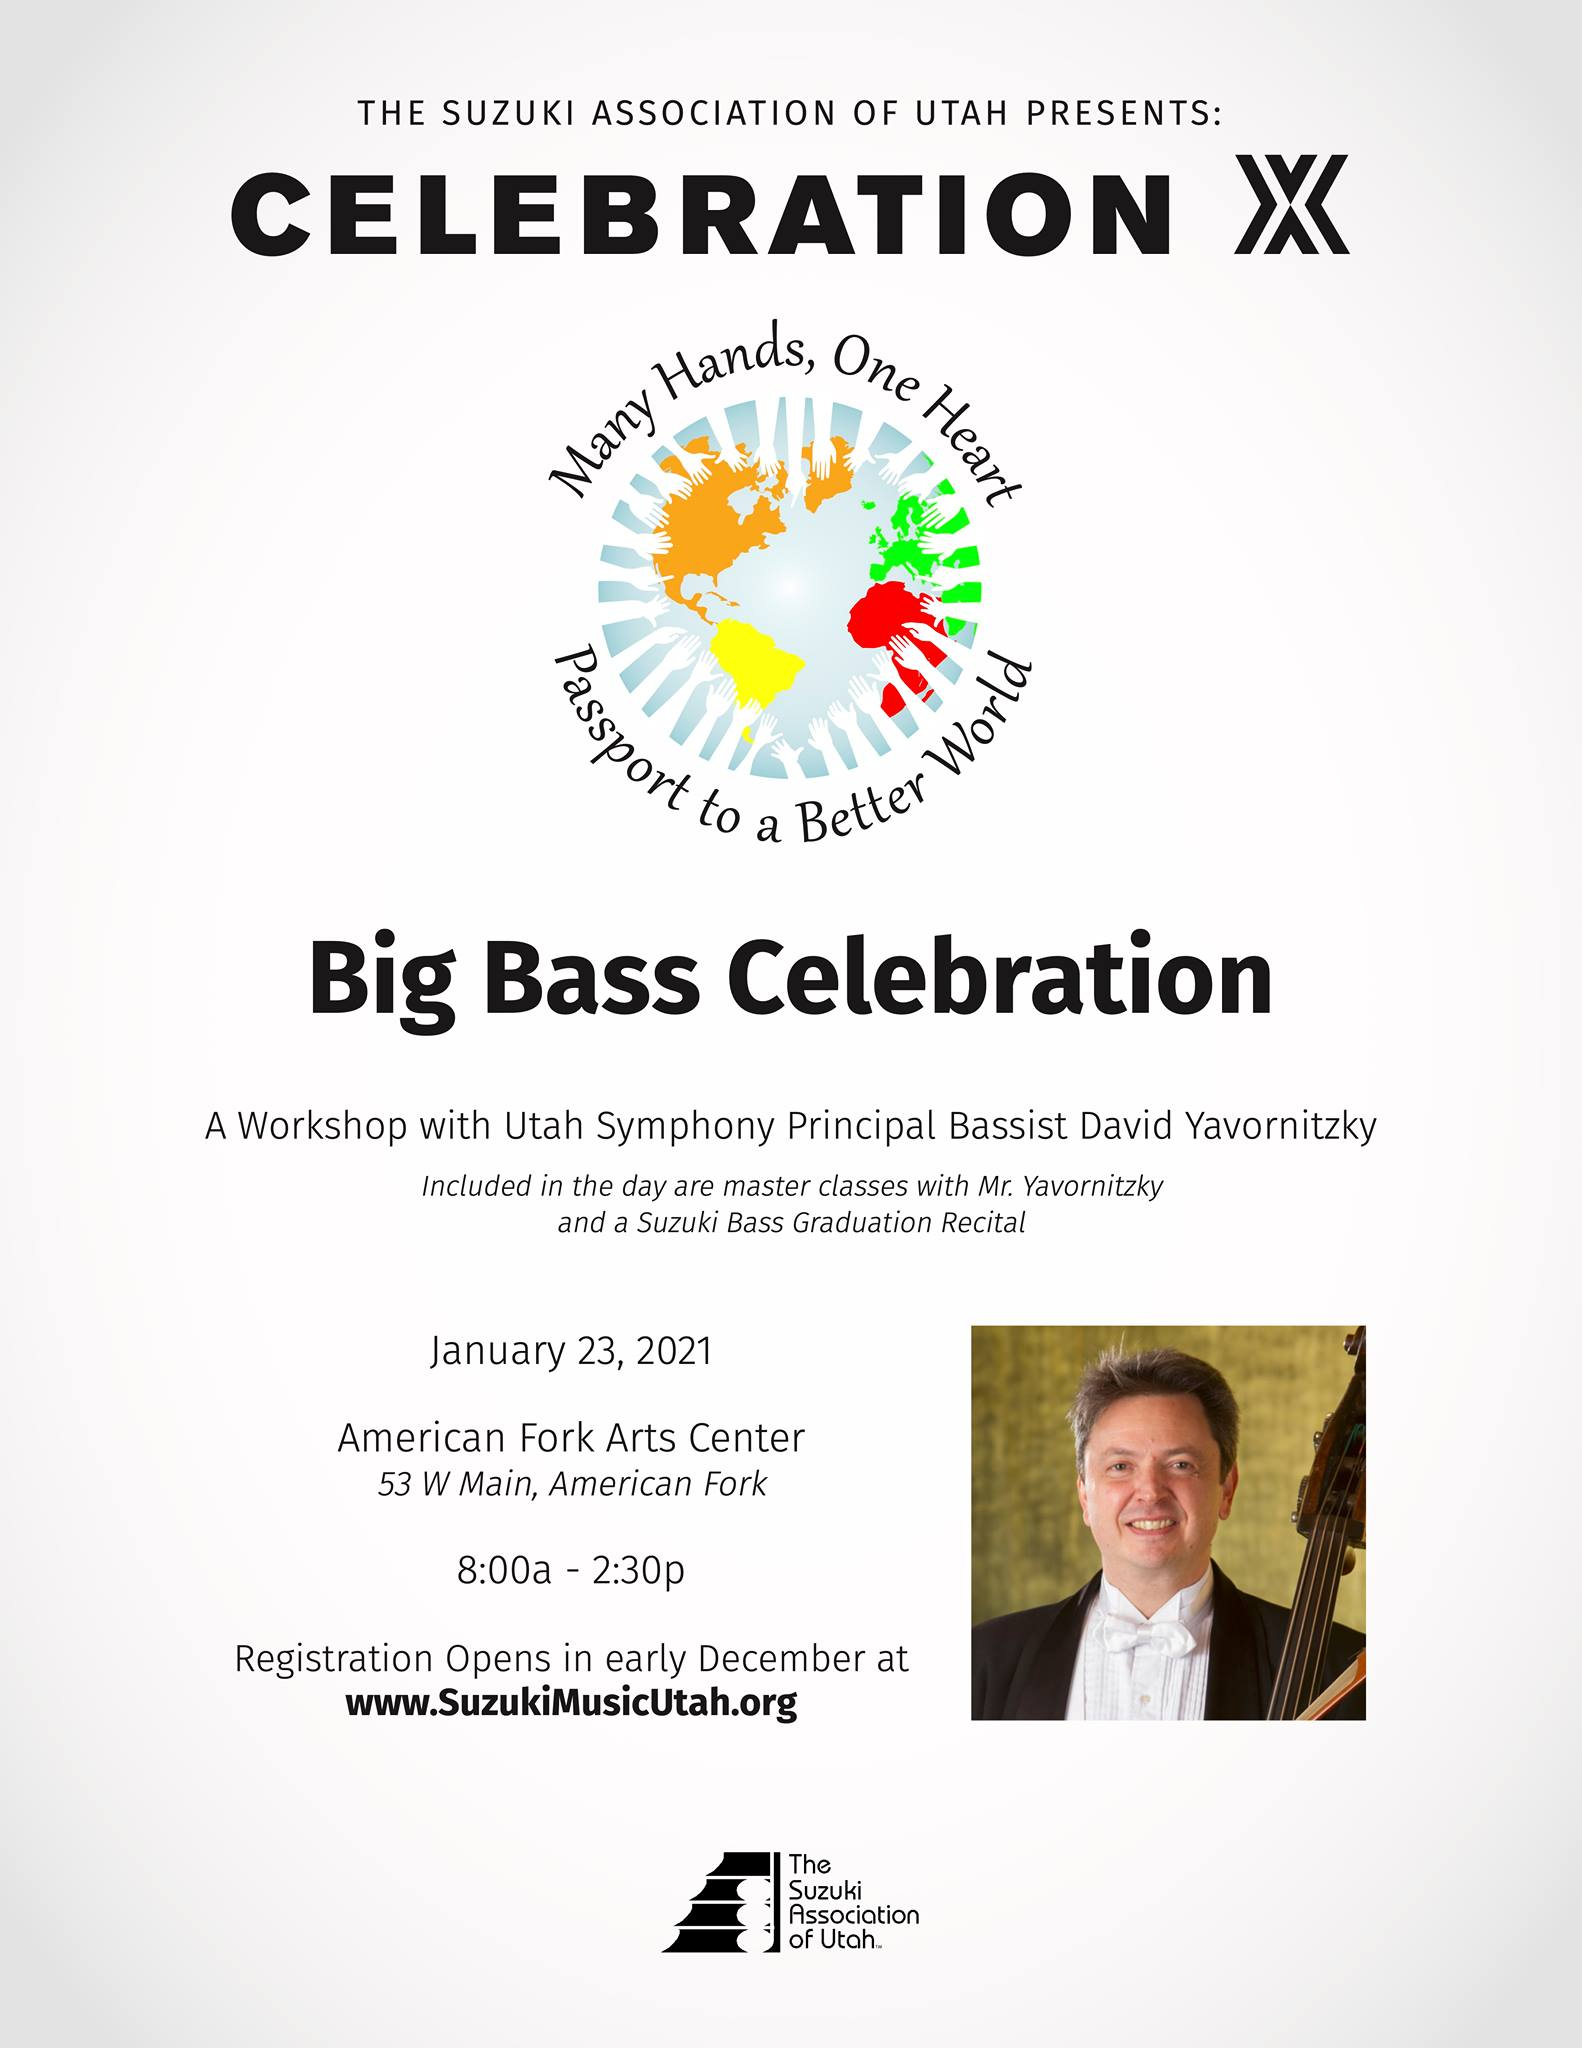 Big Bass Celebration